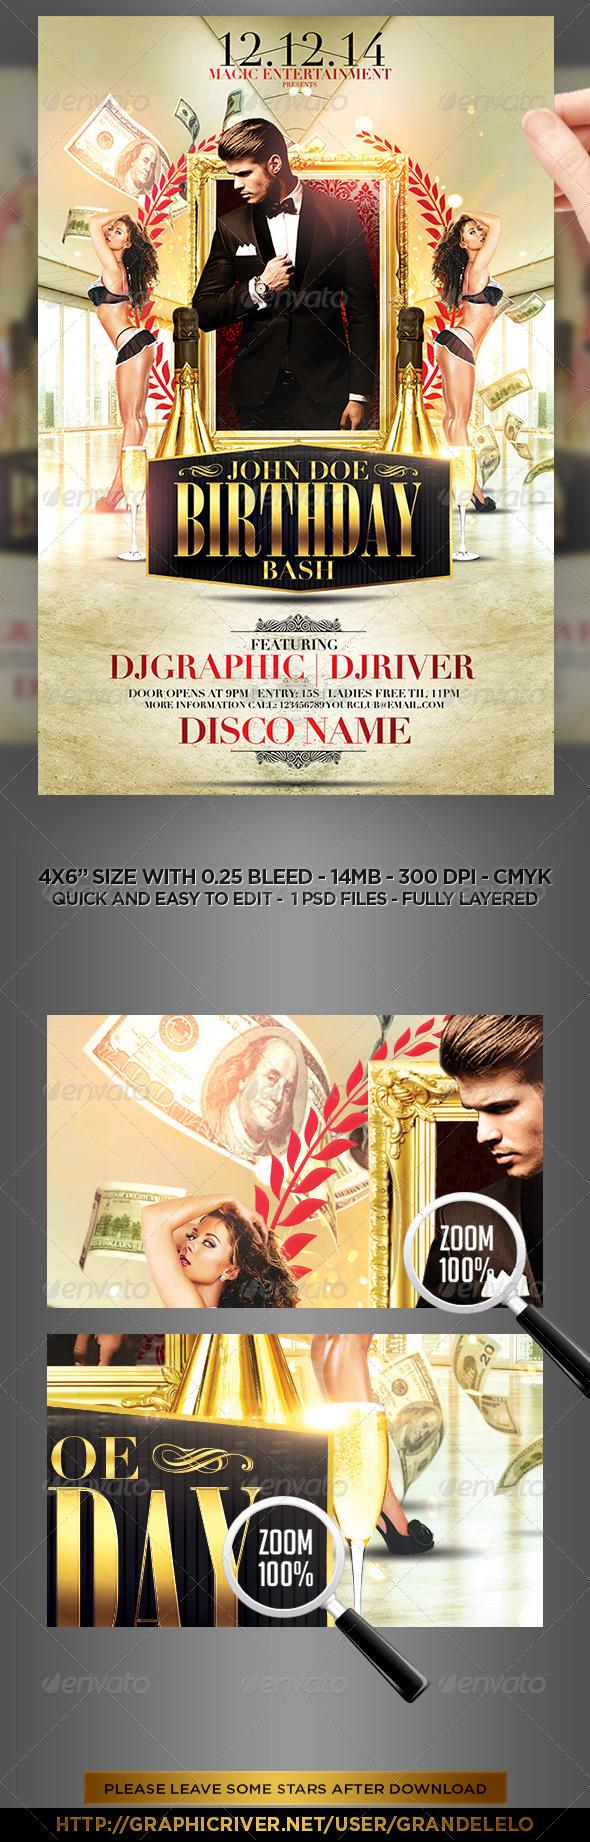 classy birthday bash flyer template by grandelelo graphicriver